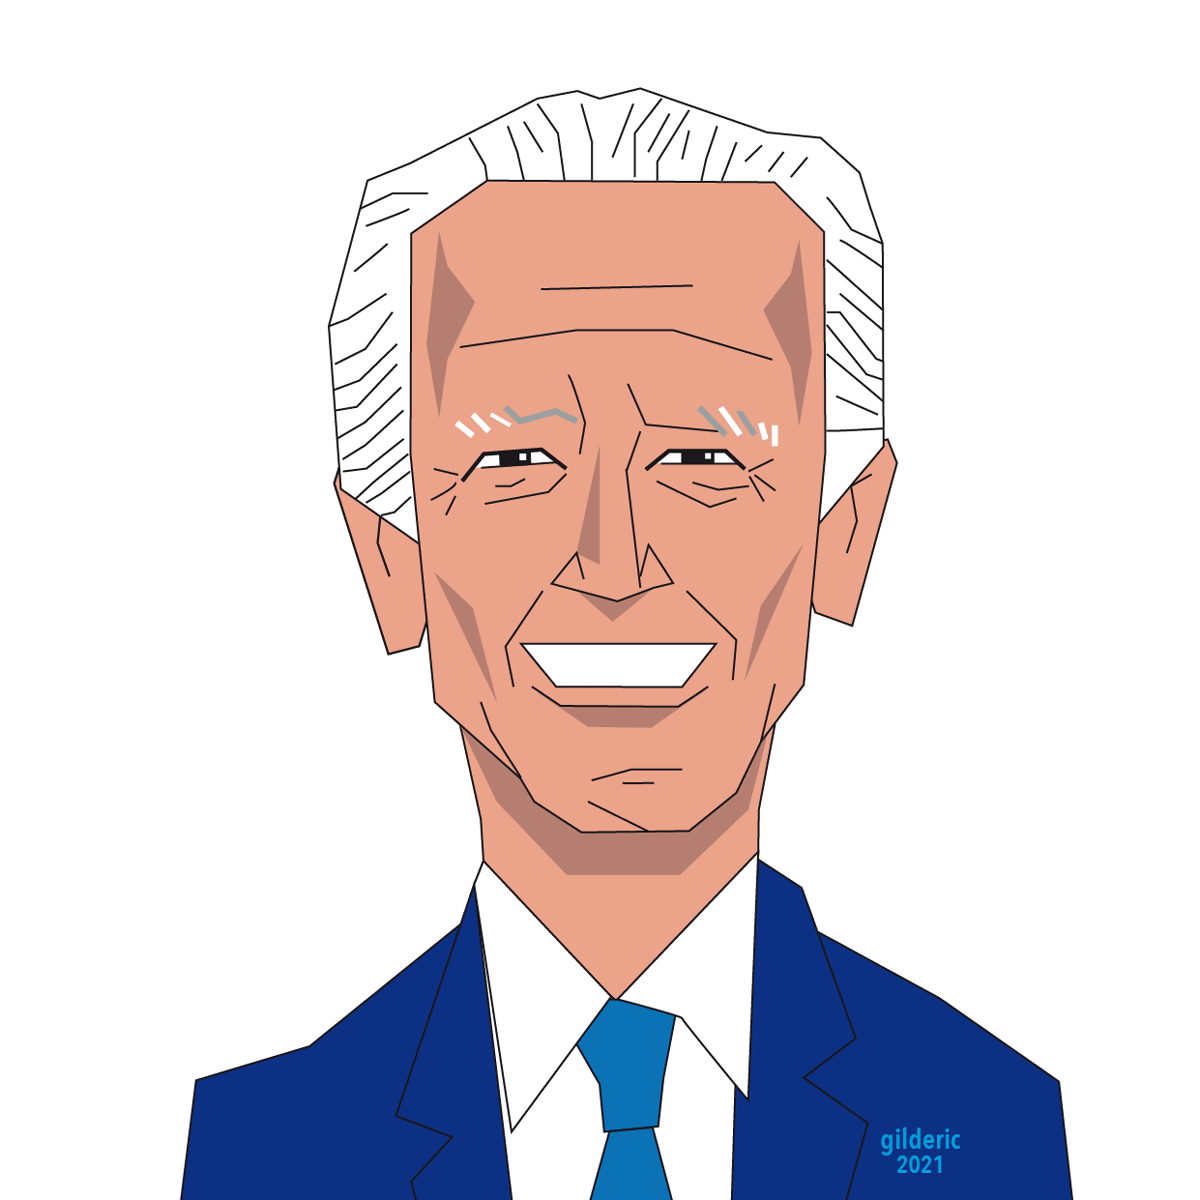 Joe Biden, portrait présidentiel avec Adobe Illustrator